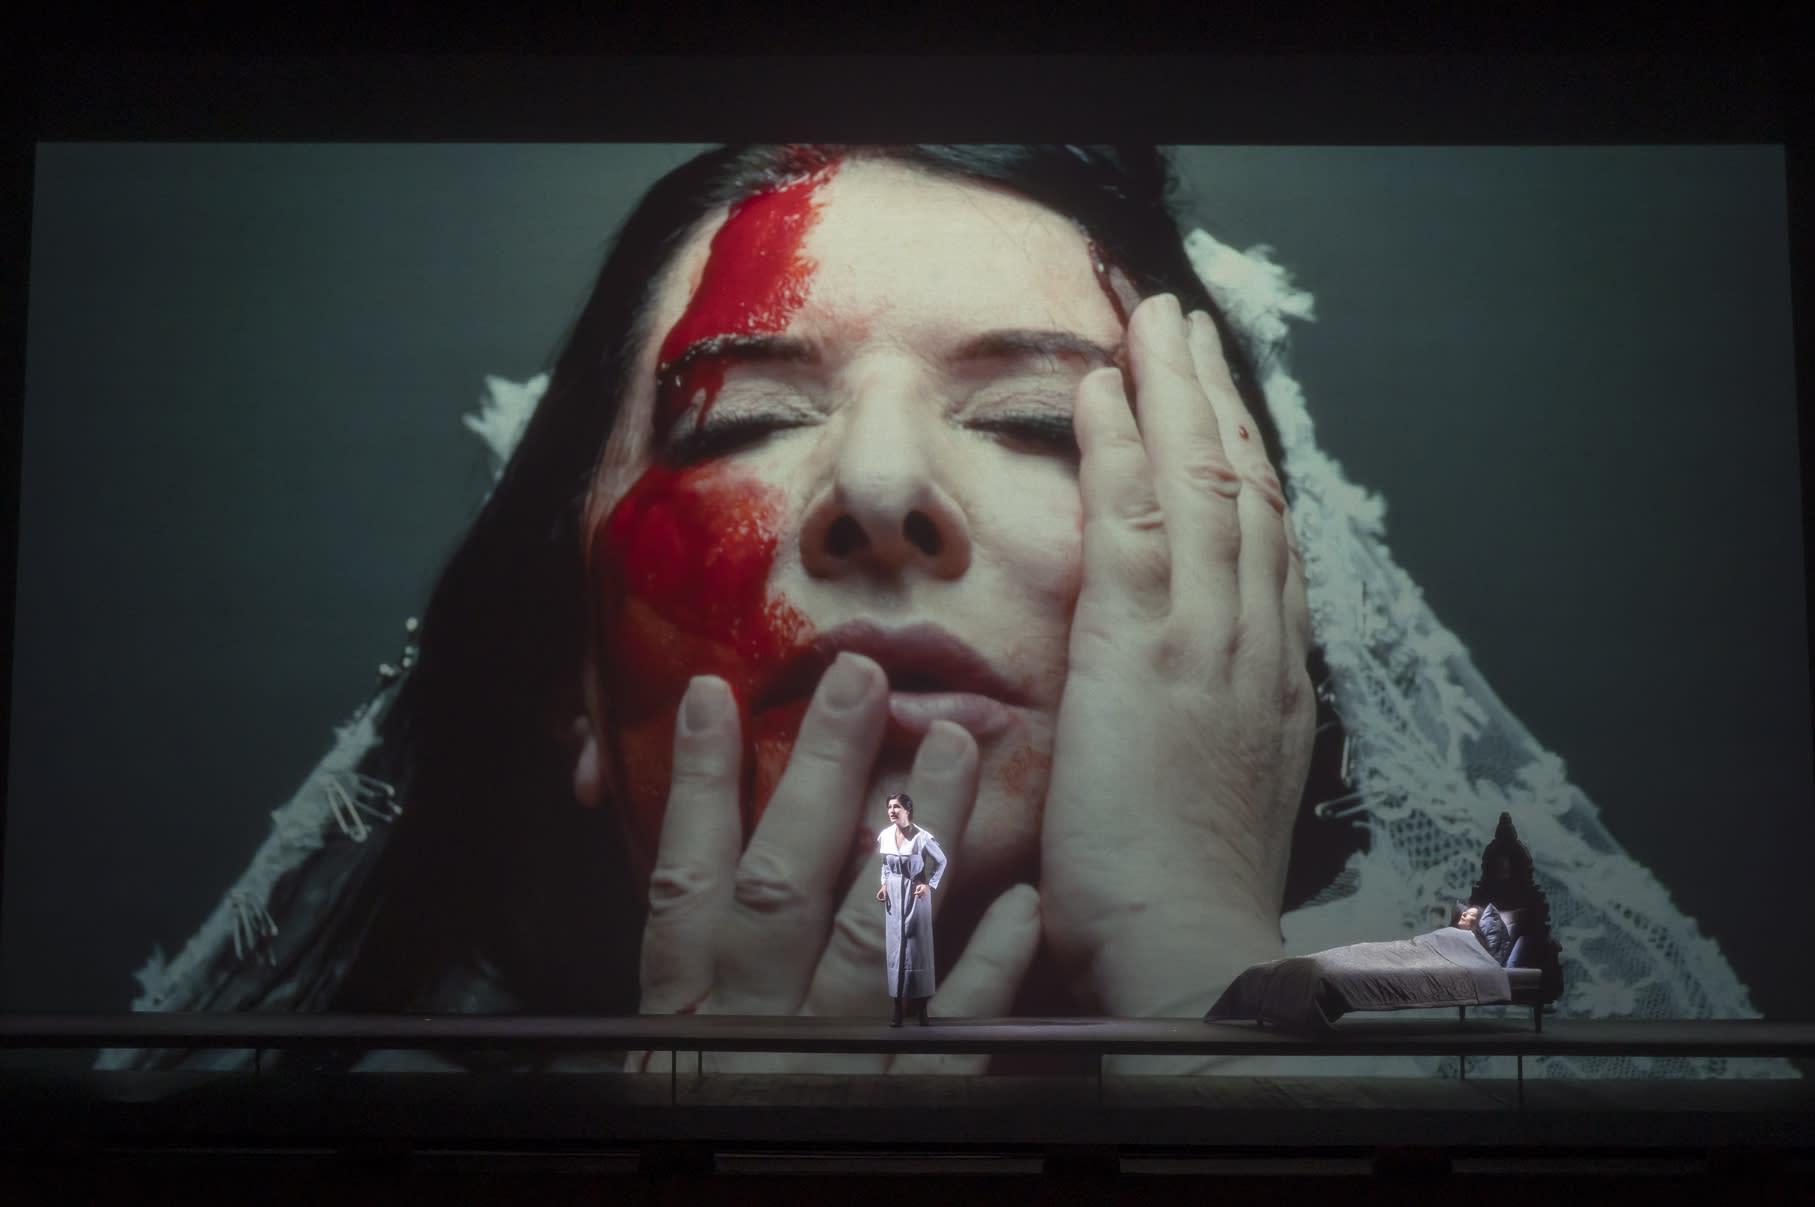 7 Deaths of Maria Callas 21-22 © Charles Duprat - OnP (4)